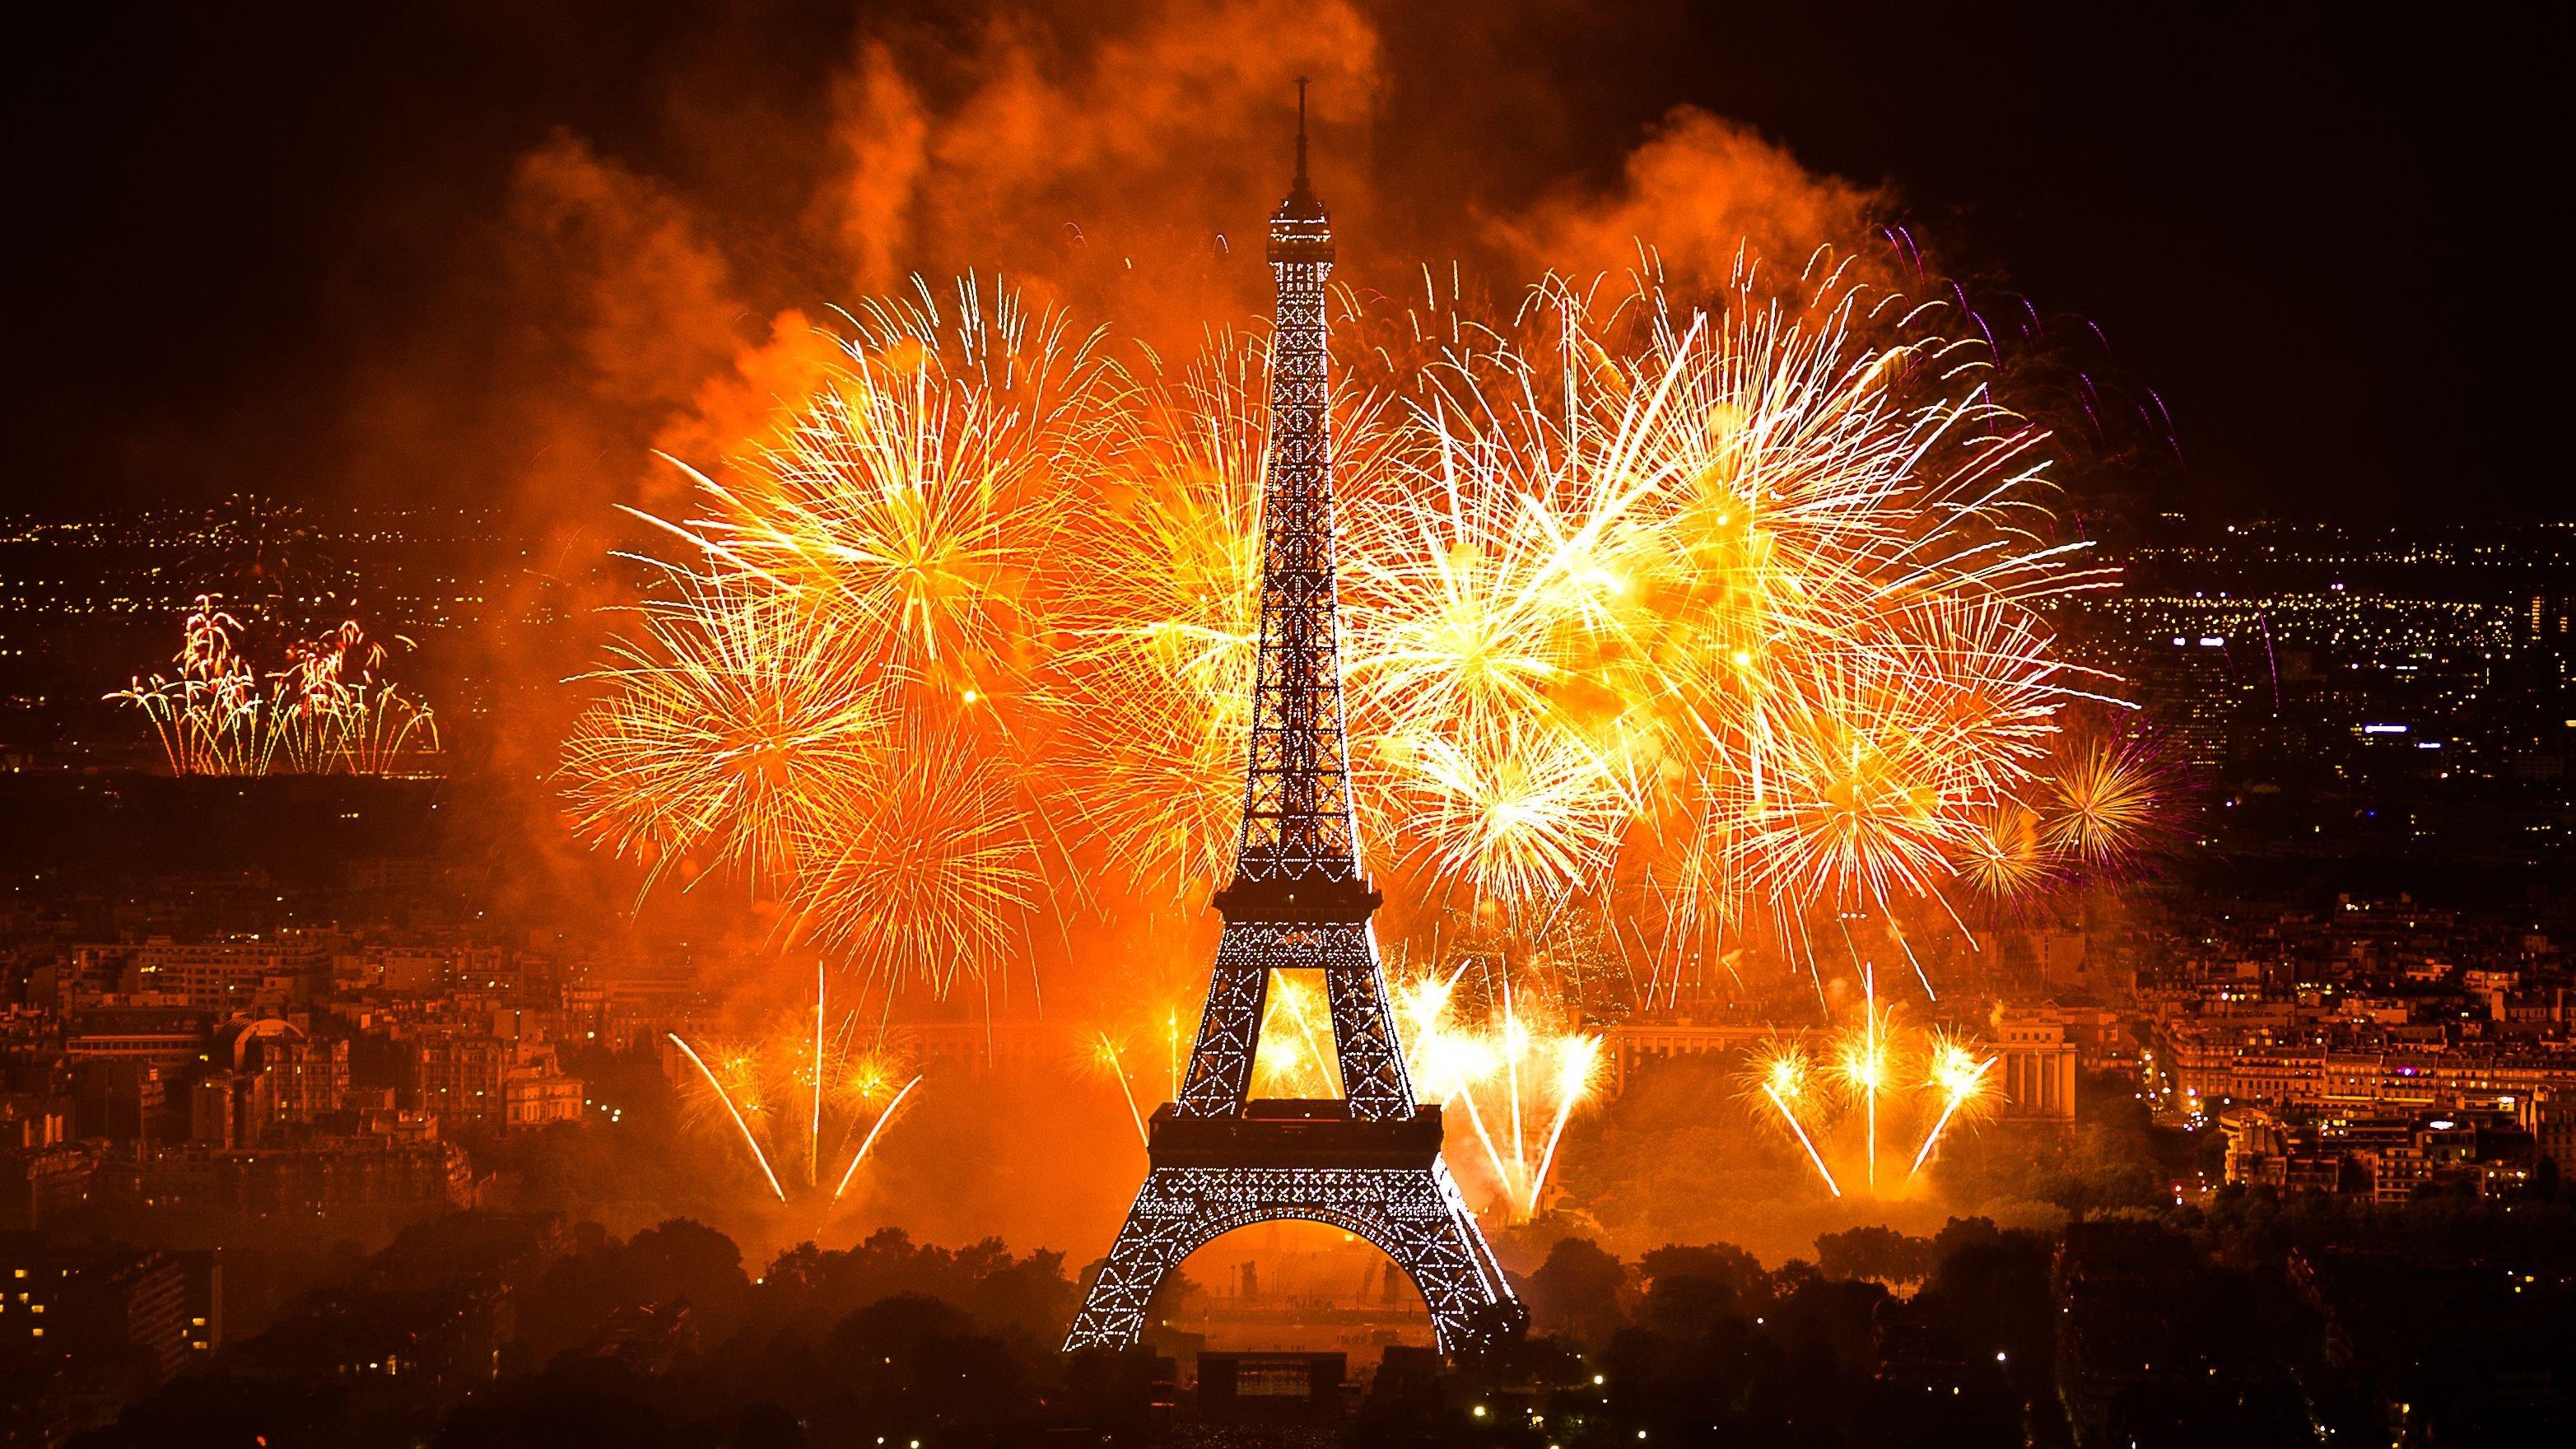 3129x1760 px city eiffel fireworks france new year paris tower